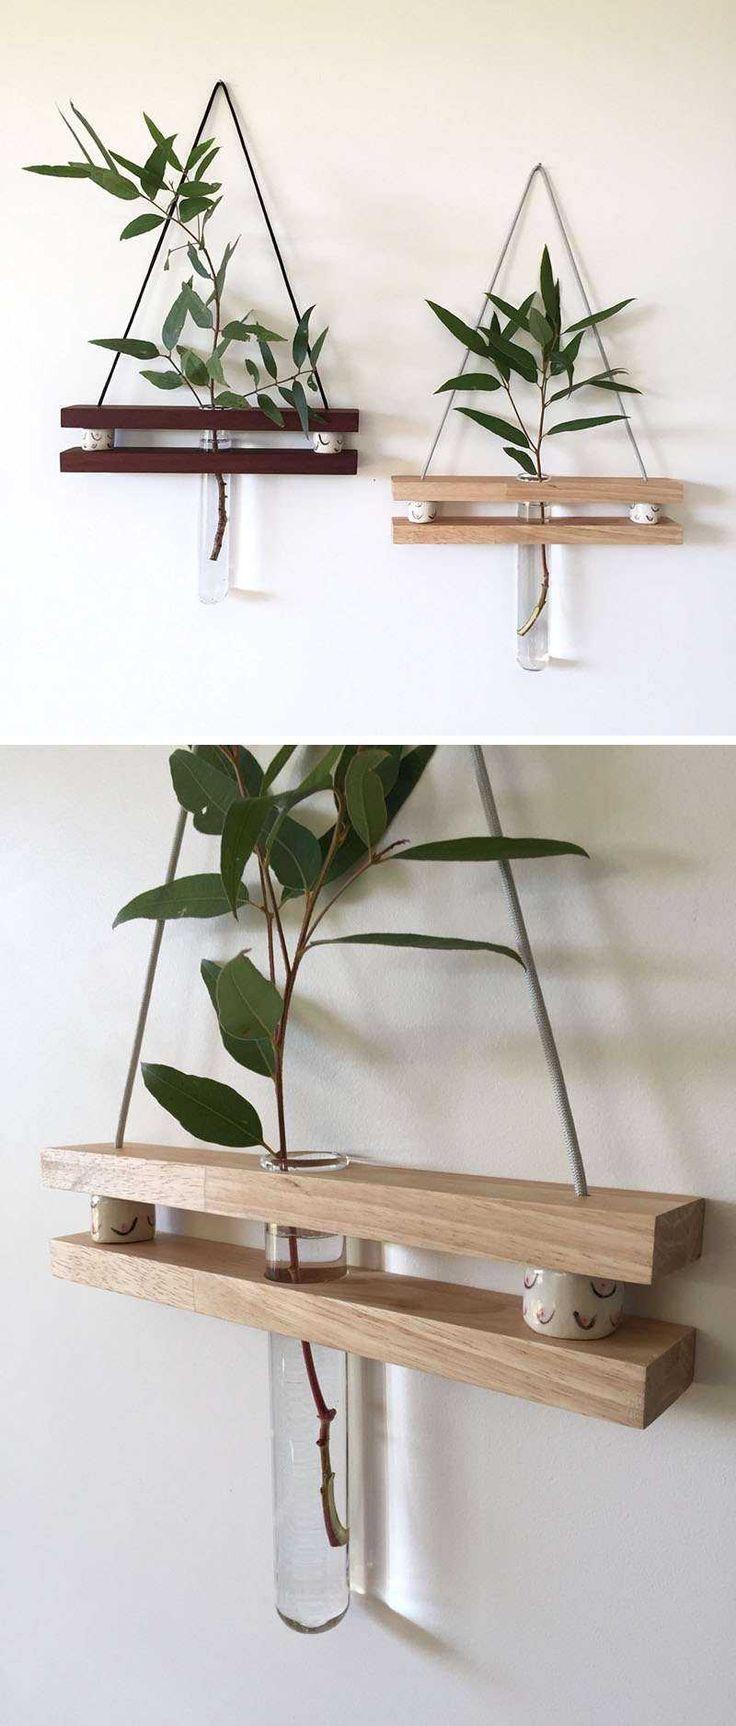 25 best ideas about plant ledge decorating on pinterest decorating ledges - Etagere suspendue ikea ...